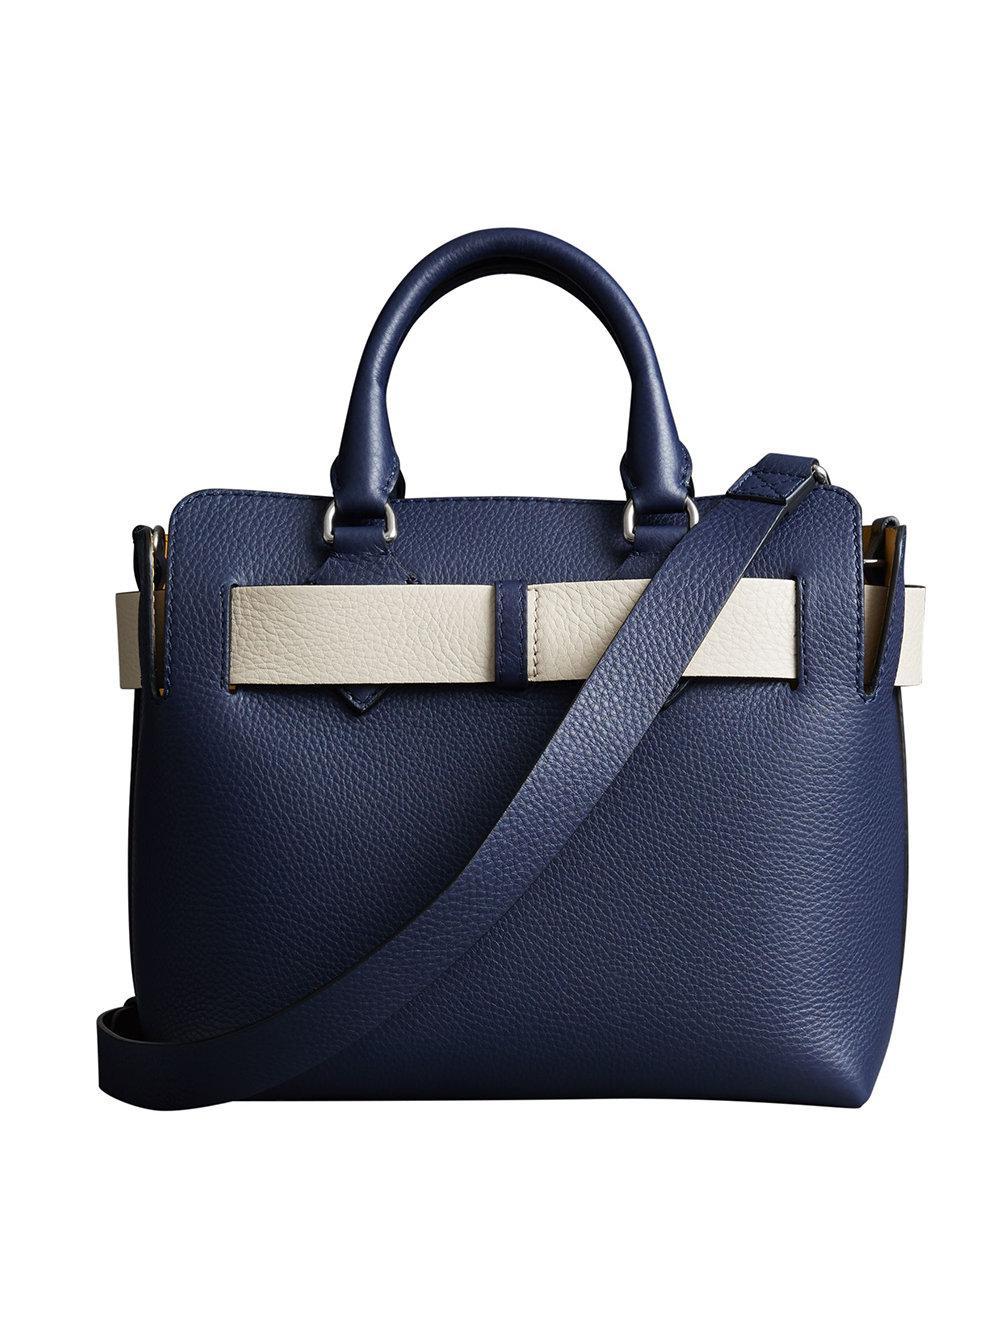 4d64d99f6d Burberry - Blue The Small Leather Belt Bag - Lyst. View fullscreen